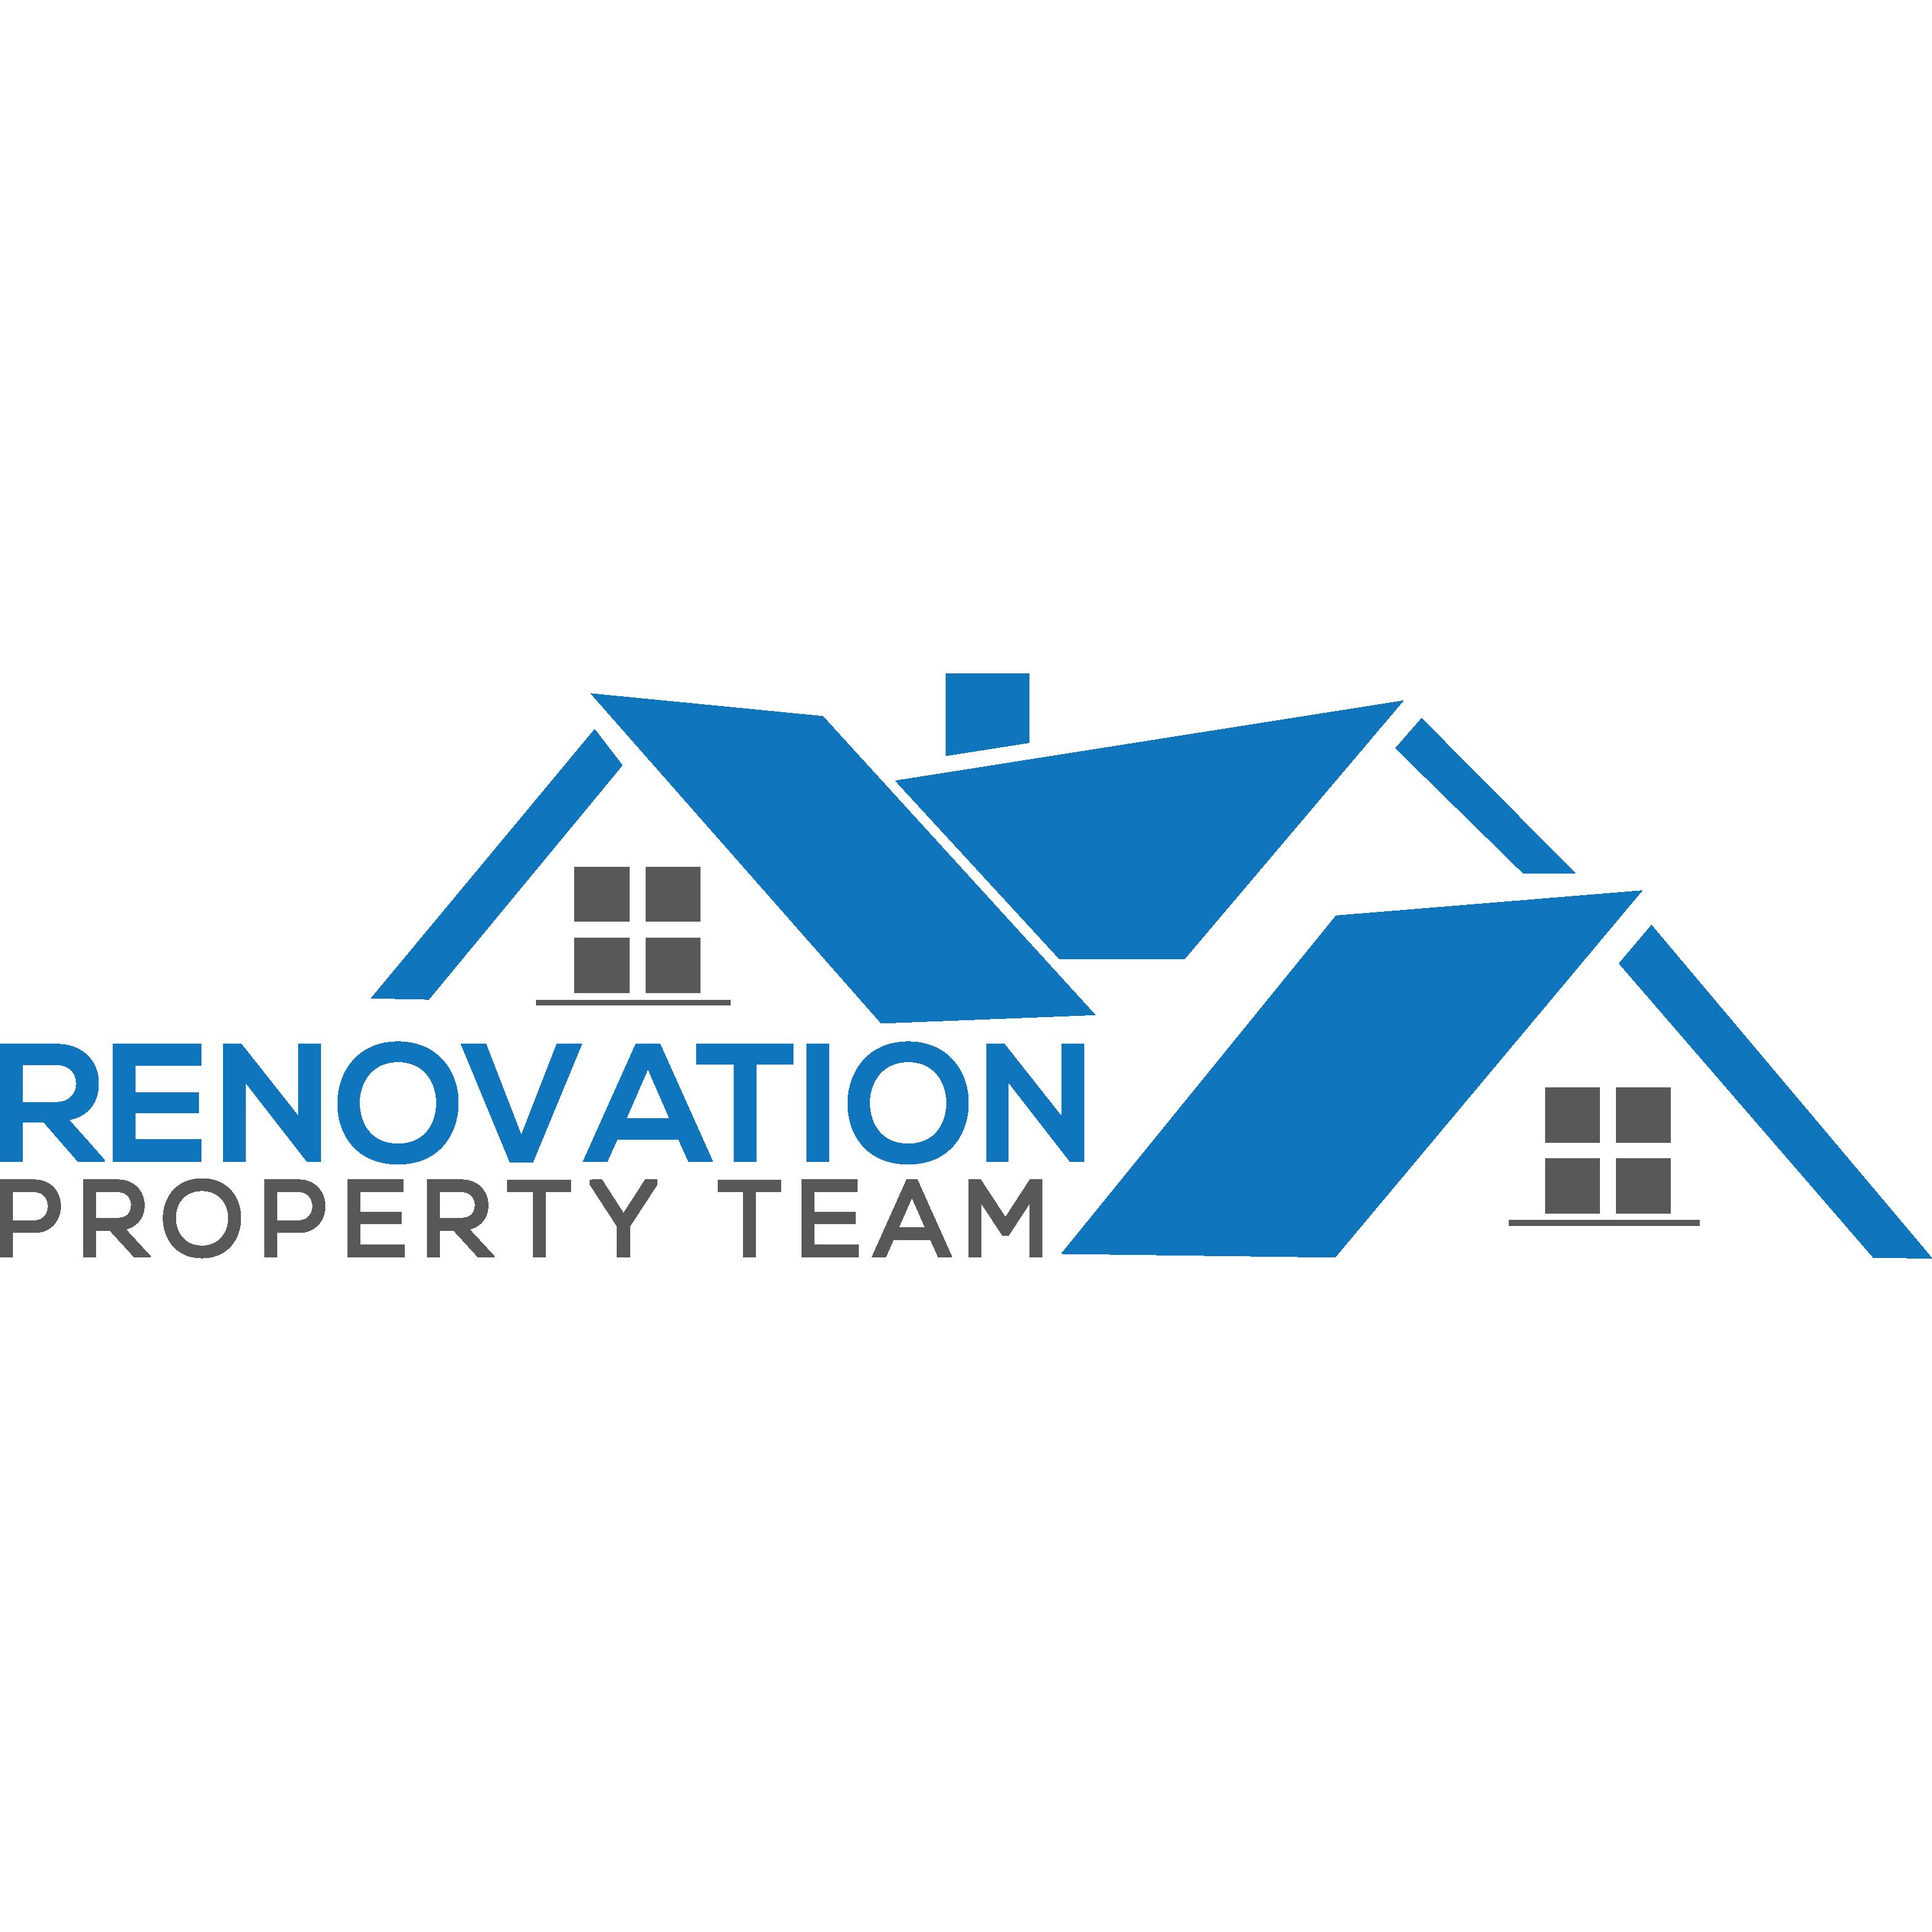 Renovation Property Team